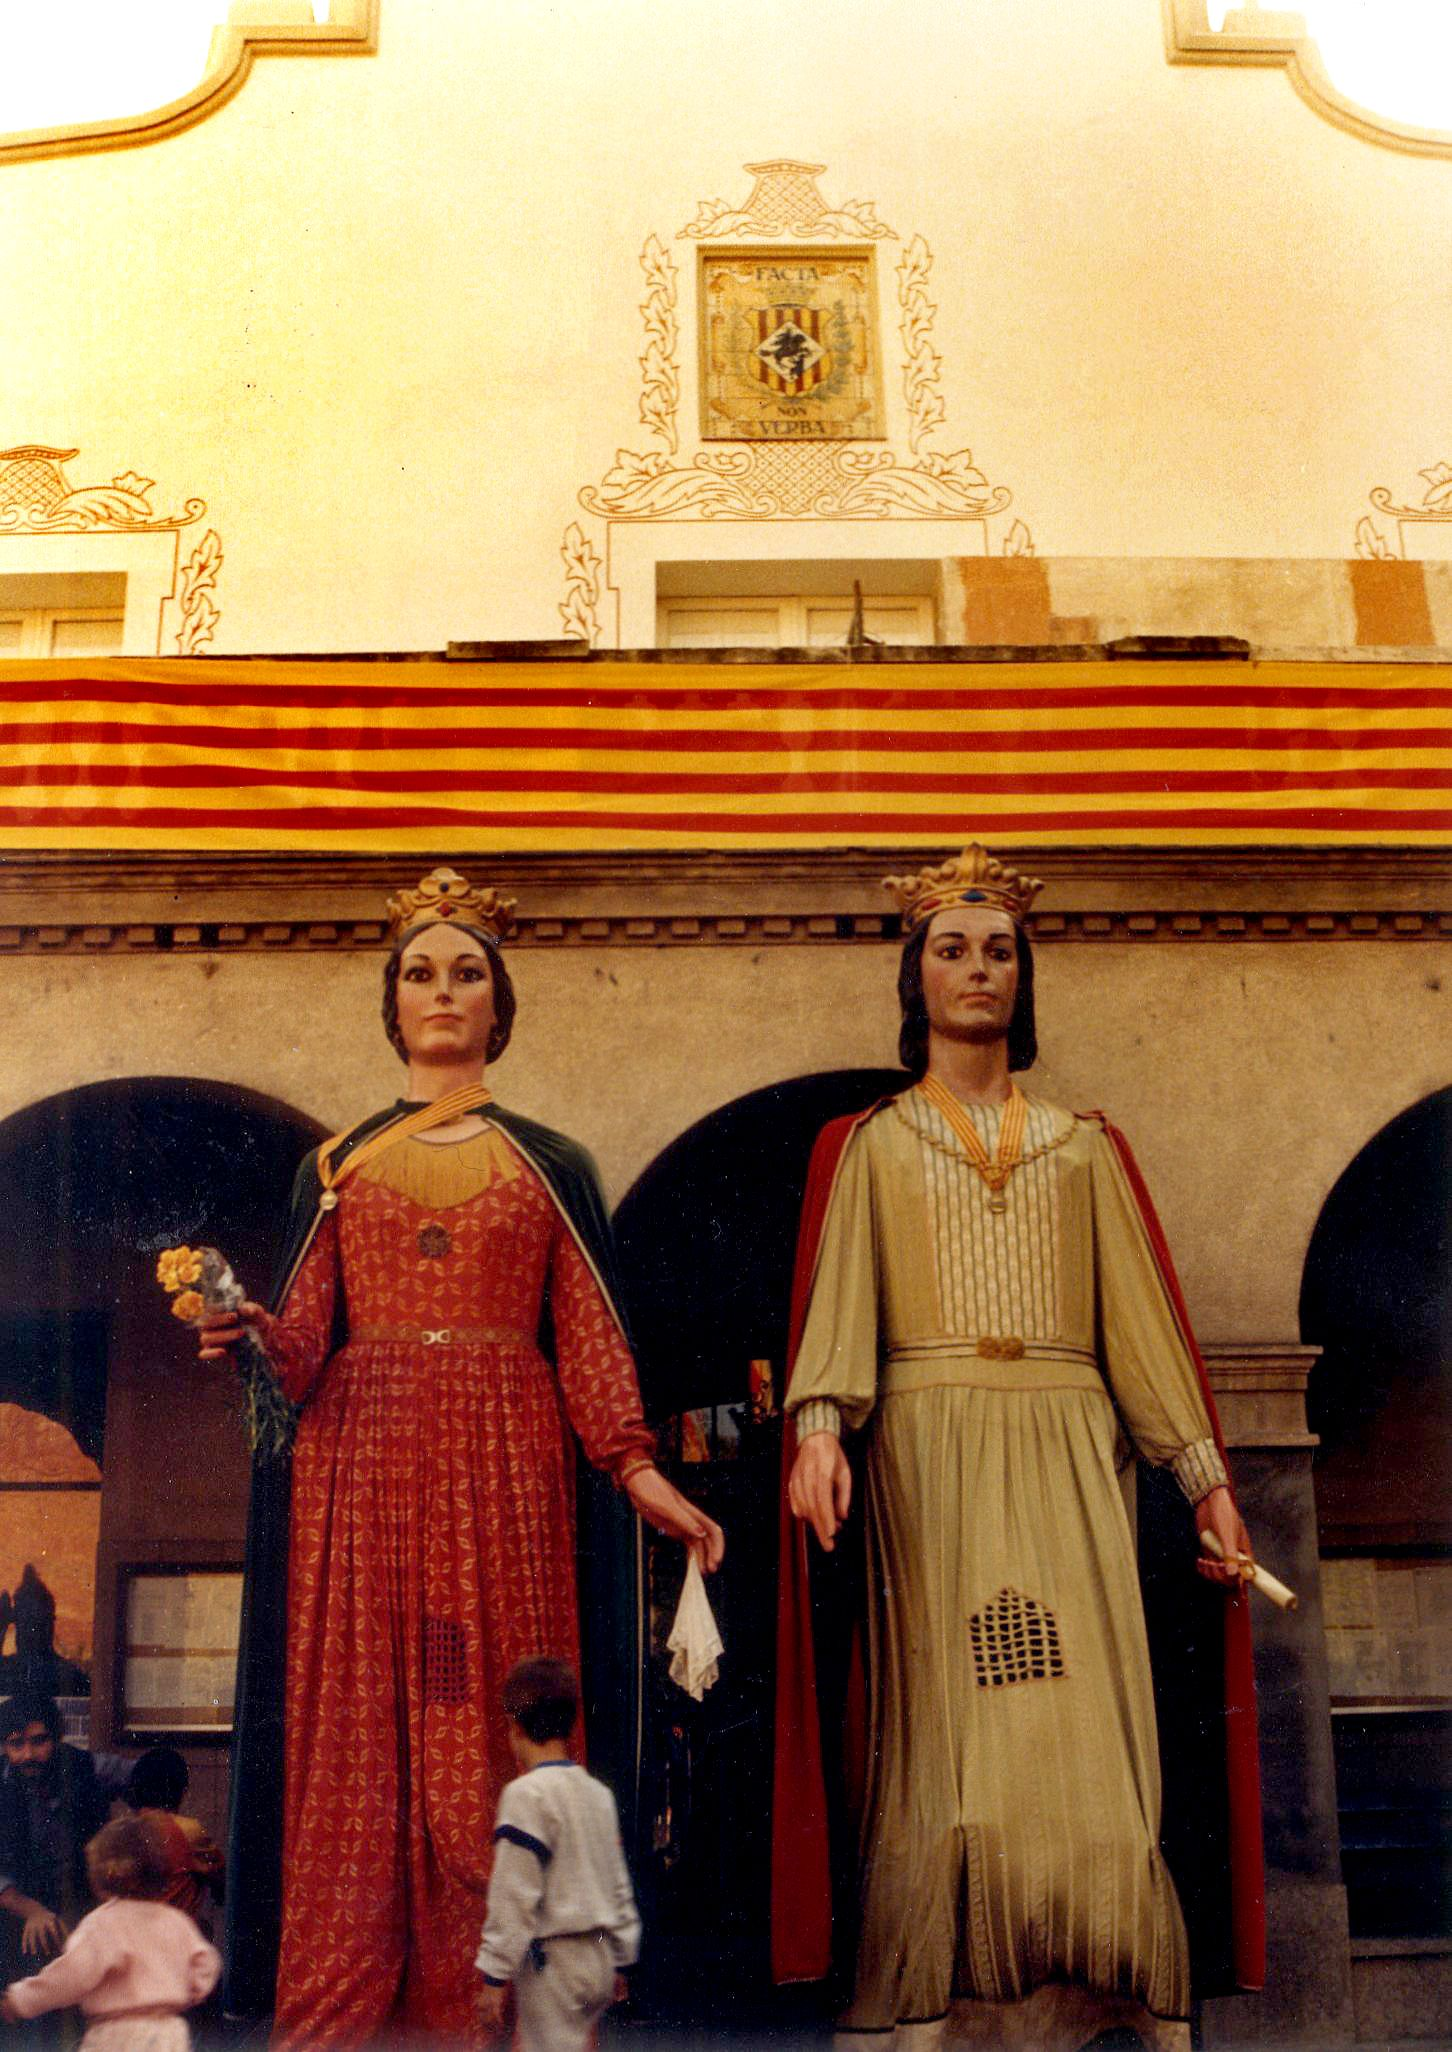 Els gegants de Cerdanyola l'any 1985. Autor: Pepe Urbano